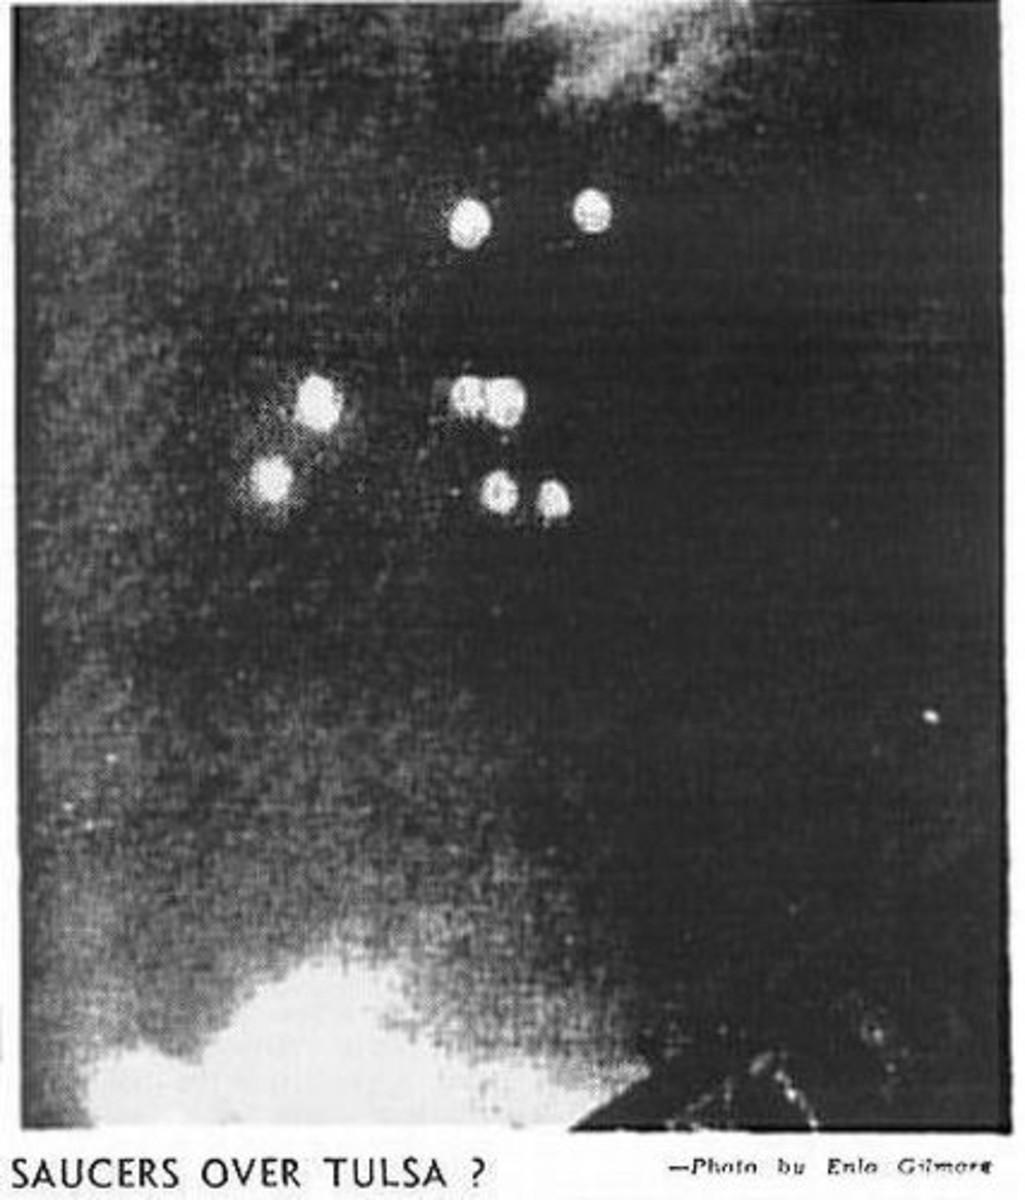 The Tulsa Oklahoma UFO Sighting - July 12, 1947